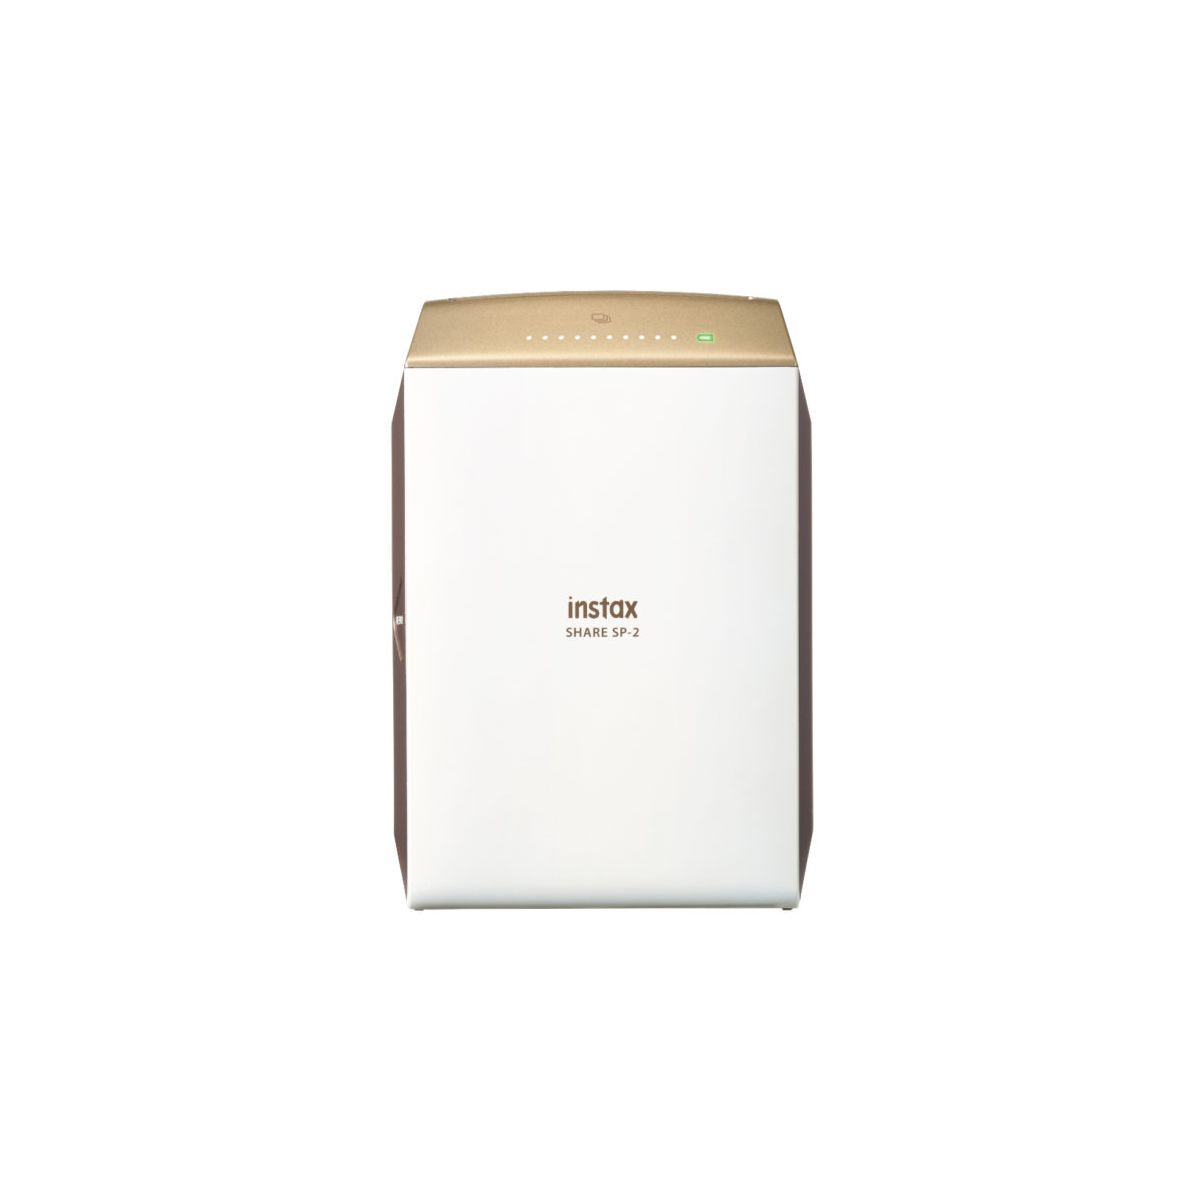 Imprimante photo portable FUJI Instax Share SP-2 doré